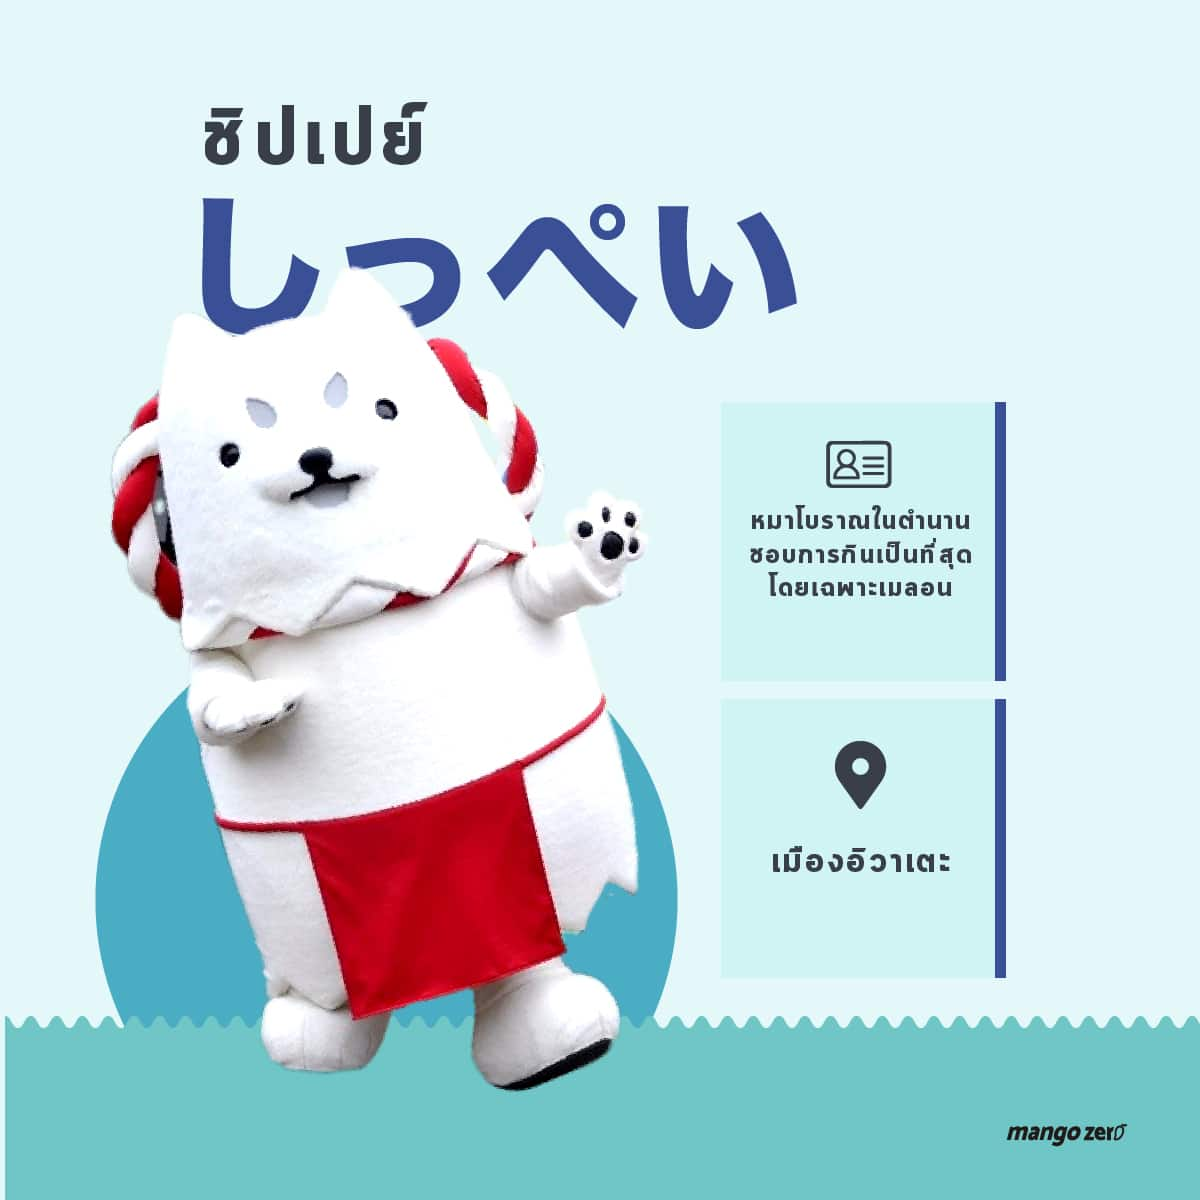 8-cute-mascots-in-japan-07-08